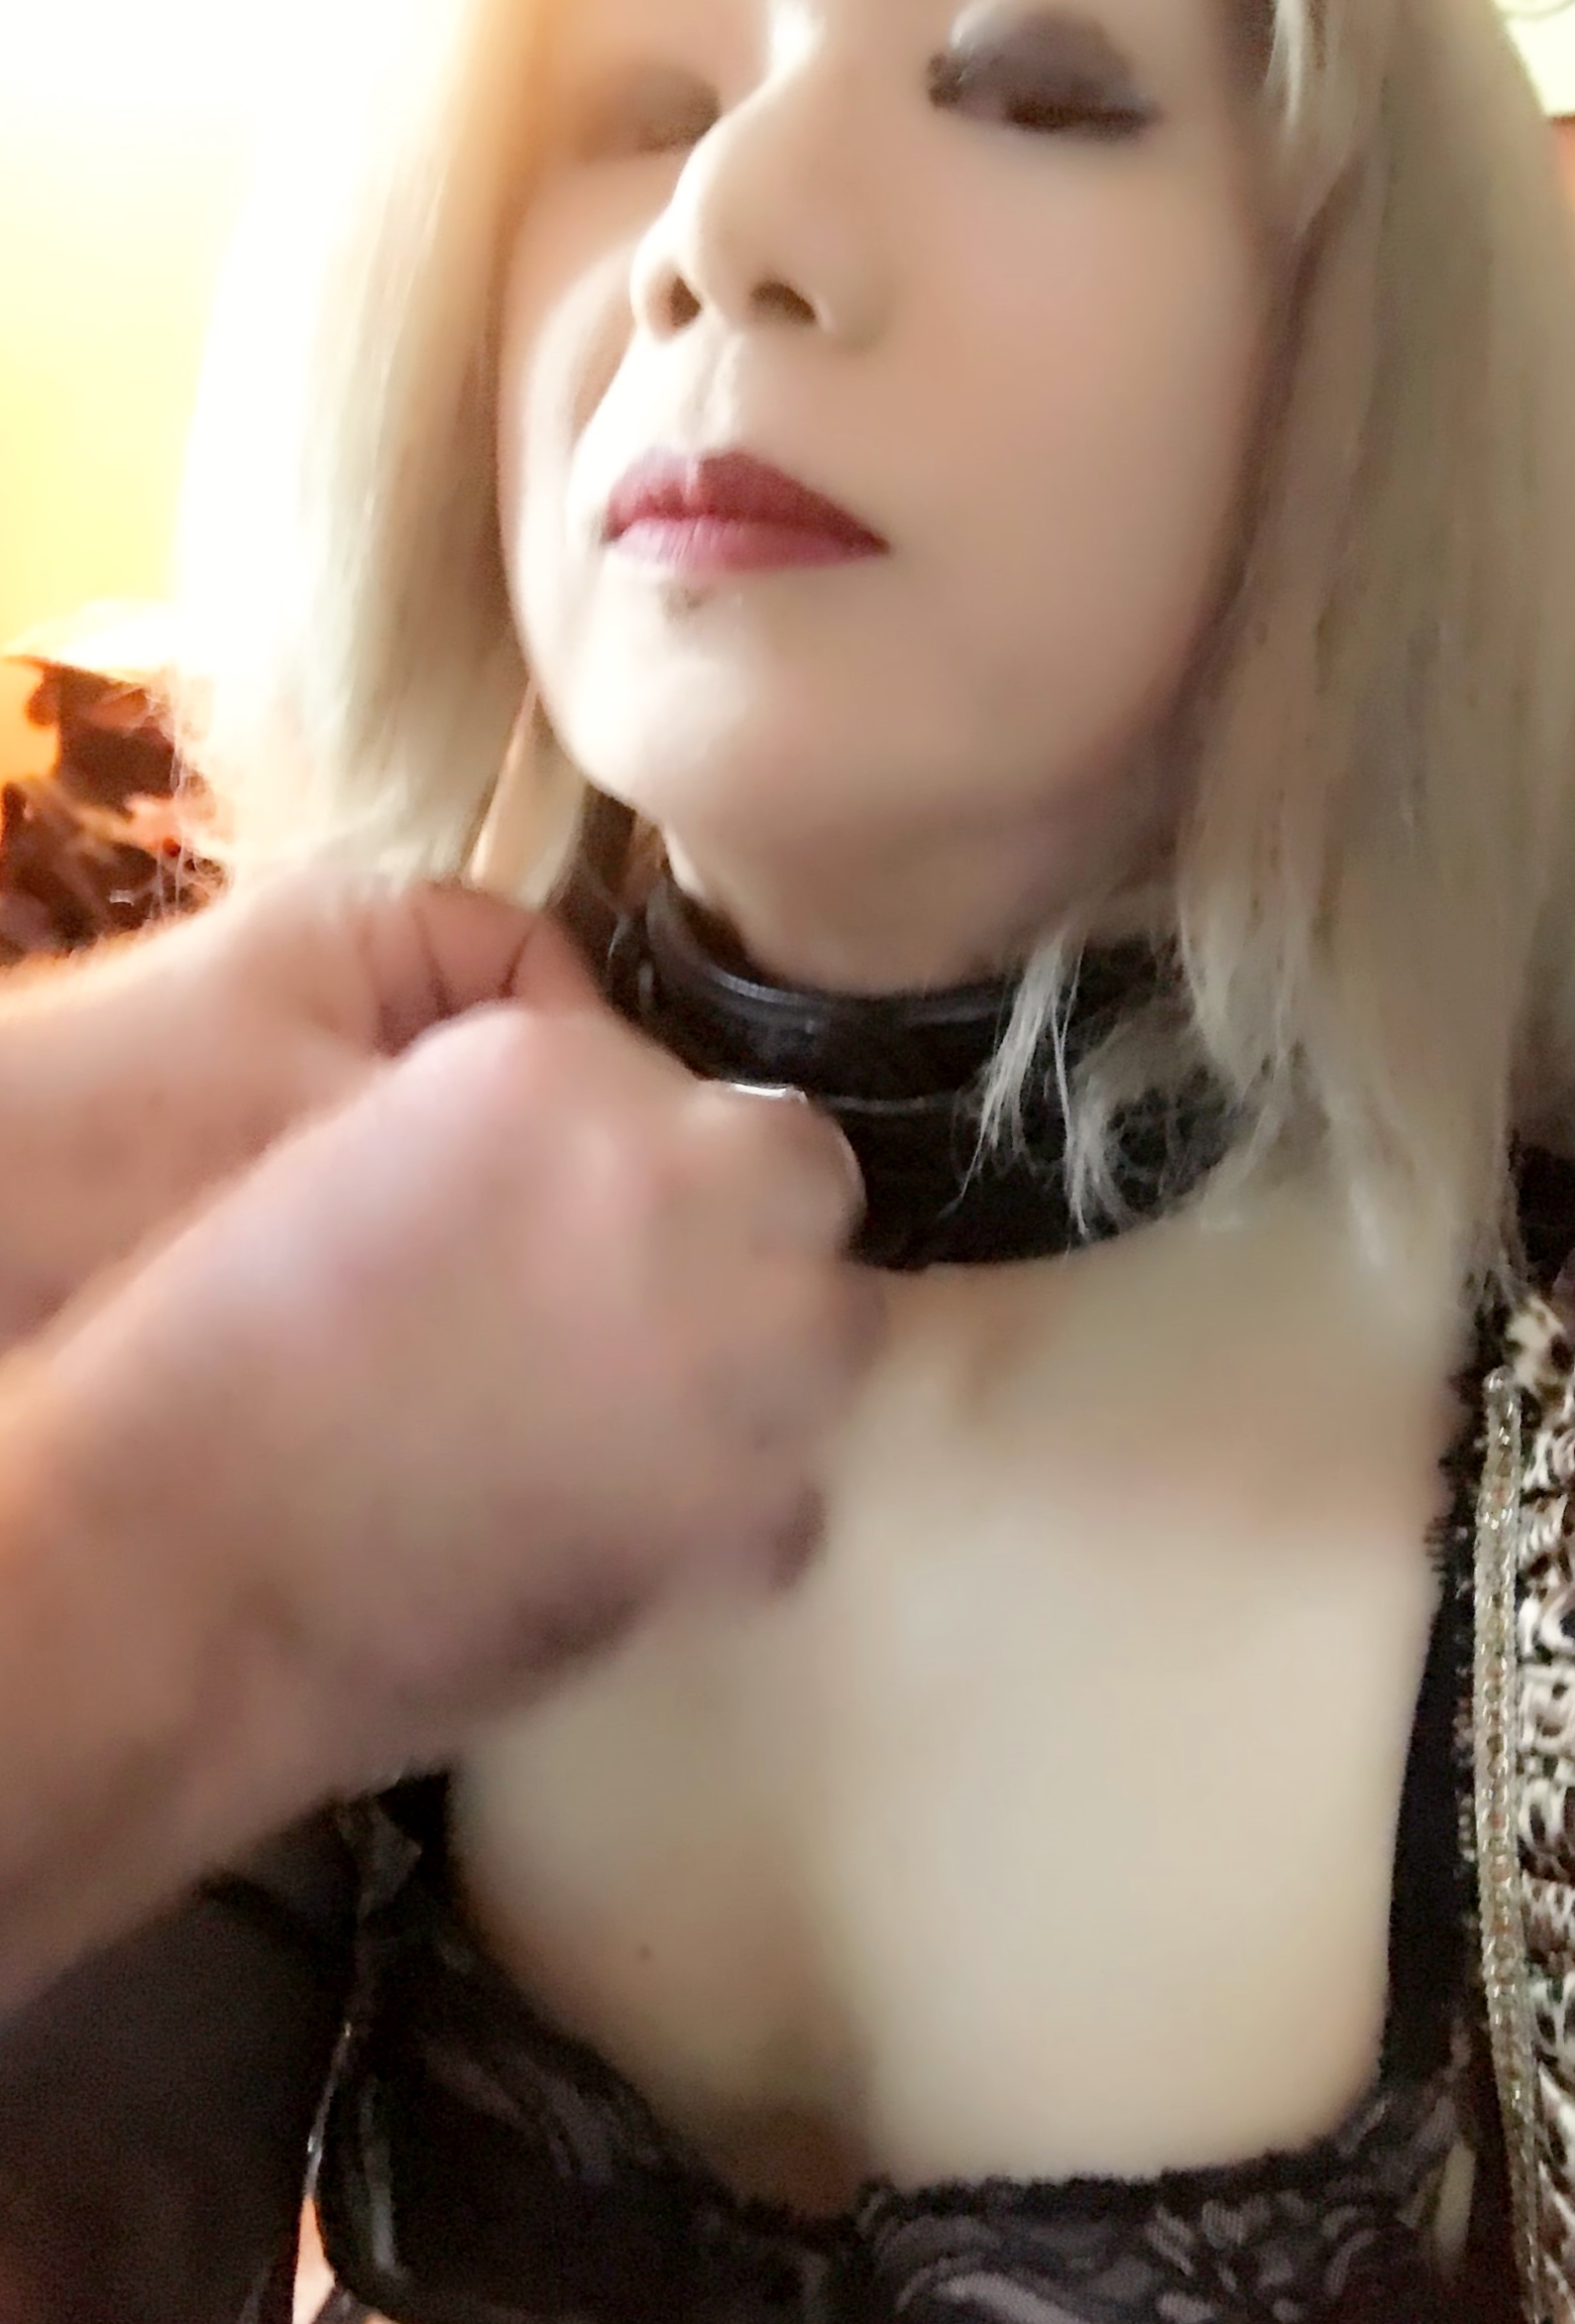 Paris hilton virgin porn